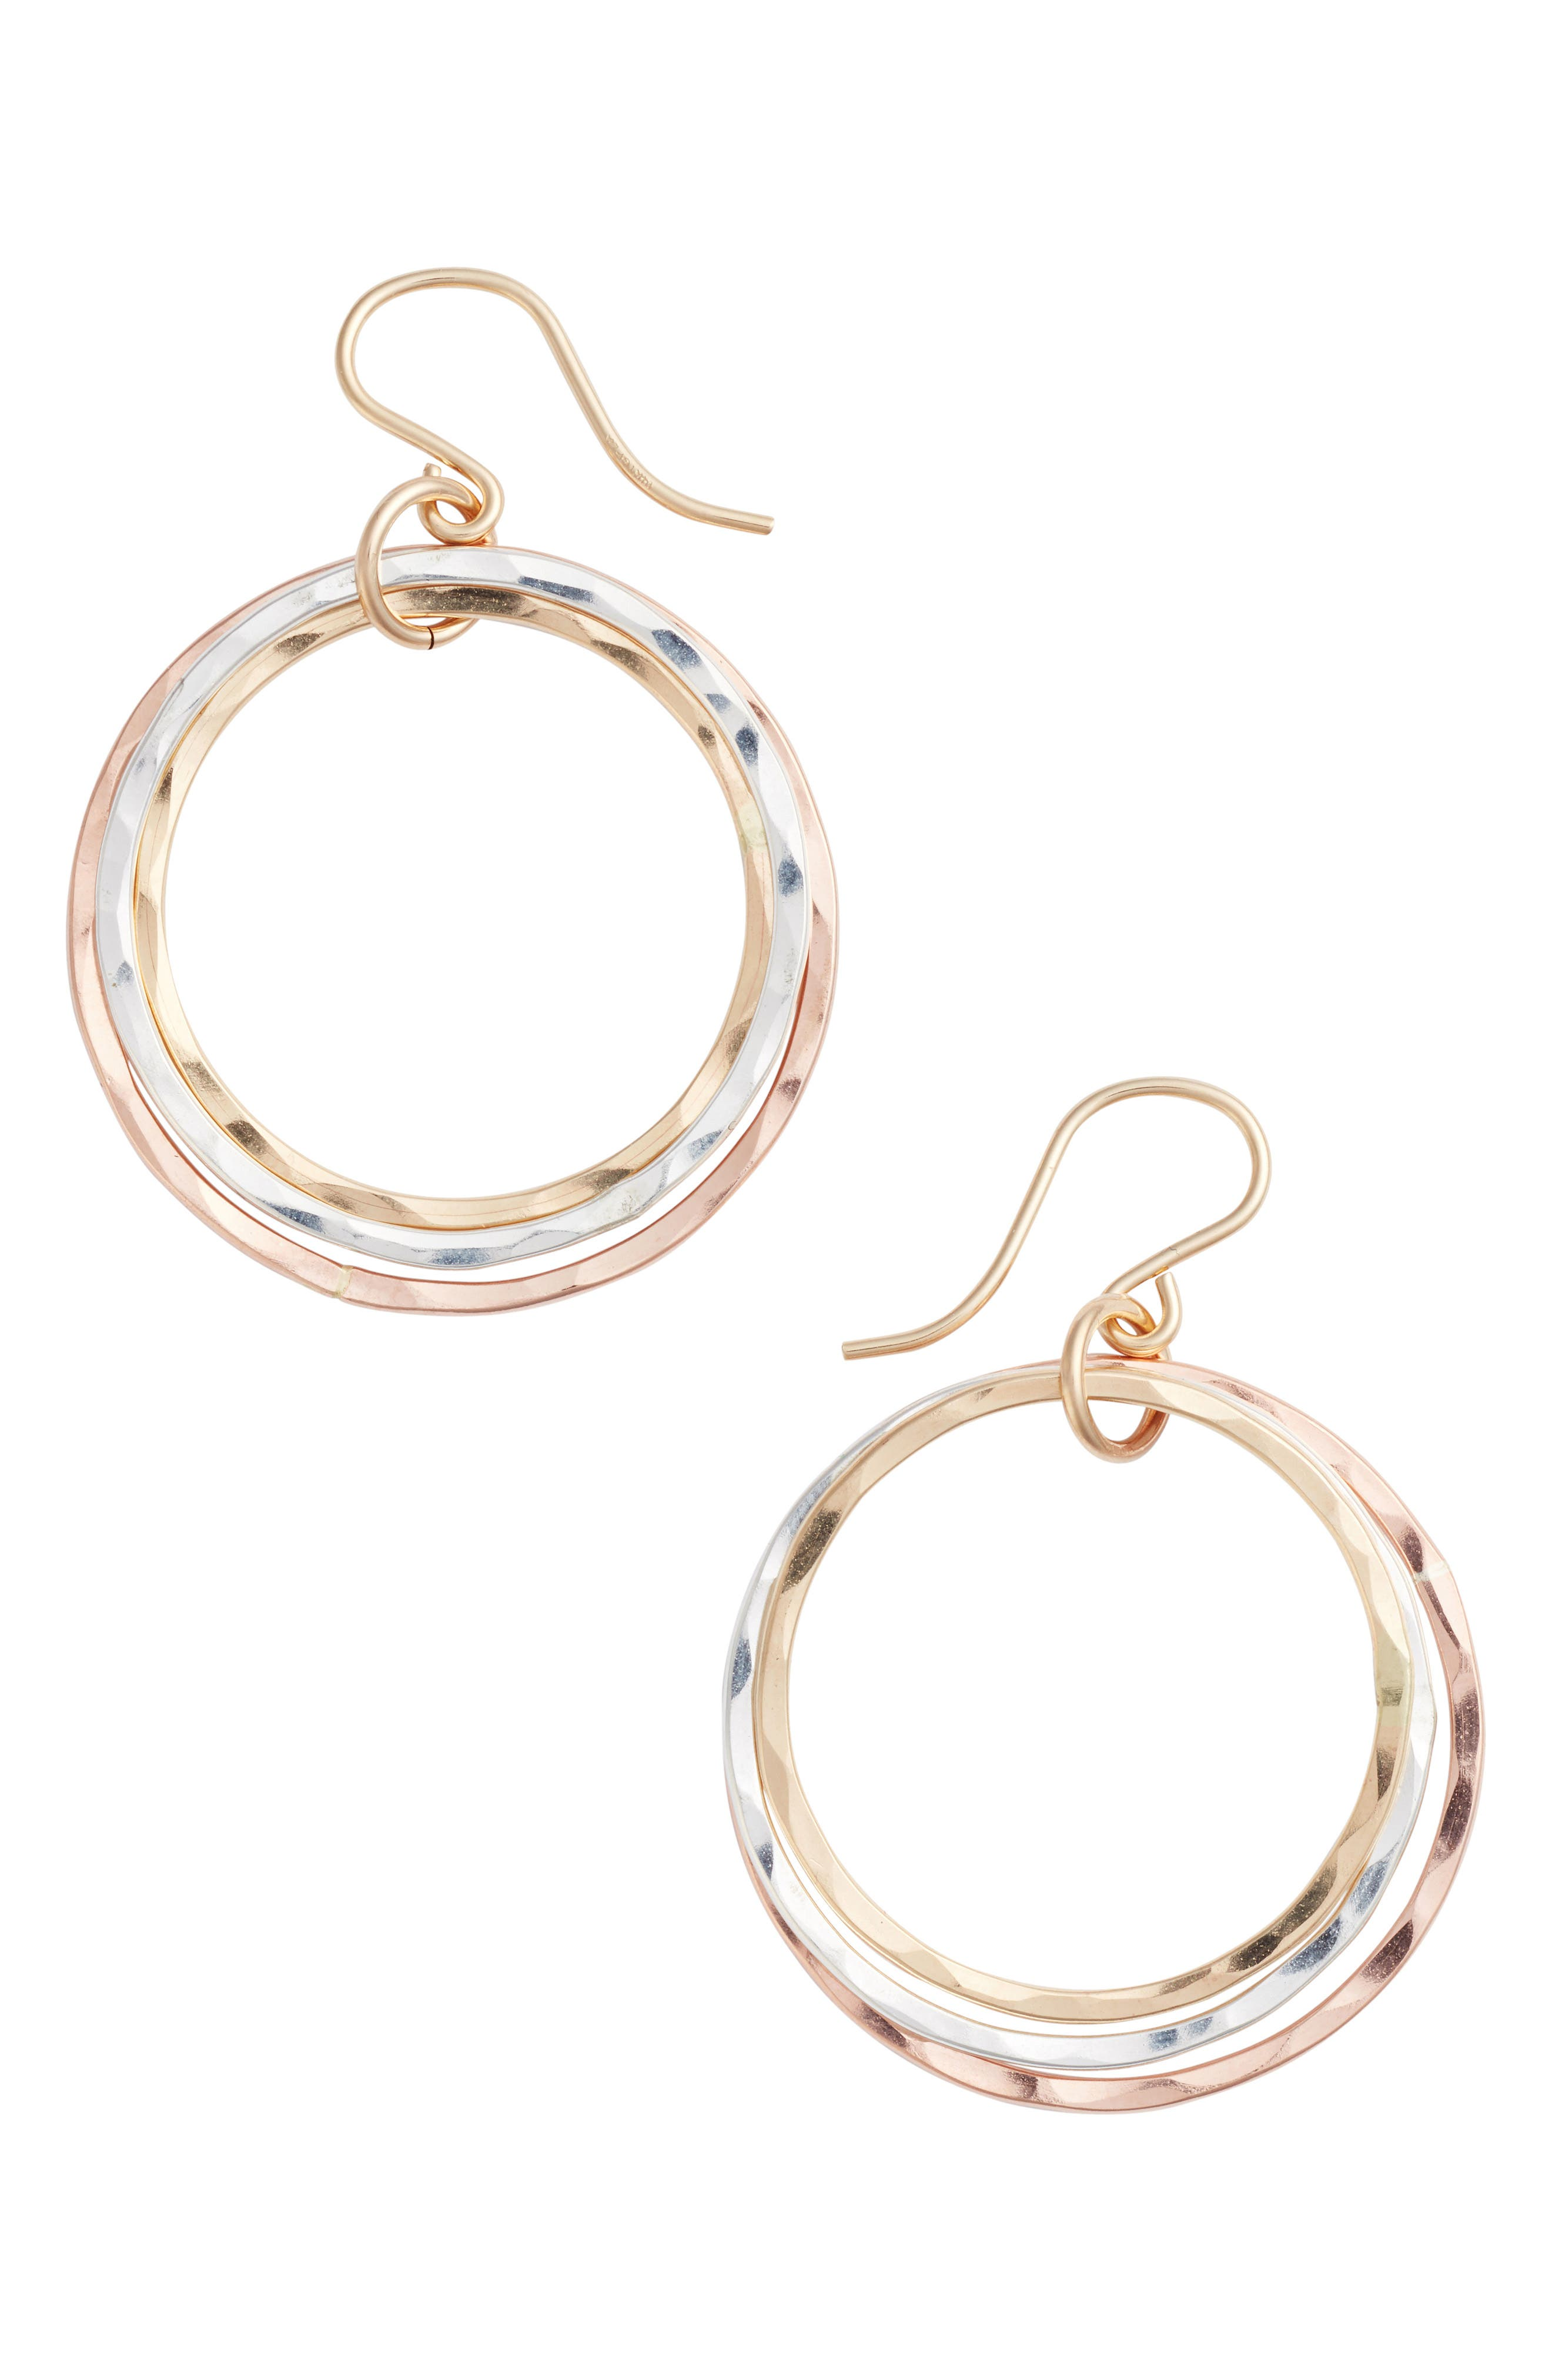 Nashelle Wellness Small Hoop Earrings